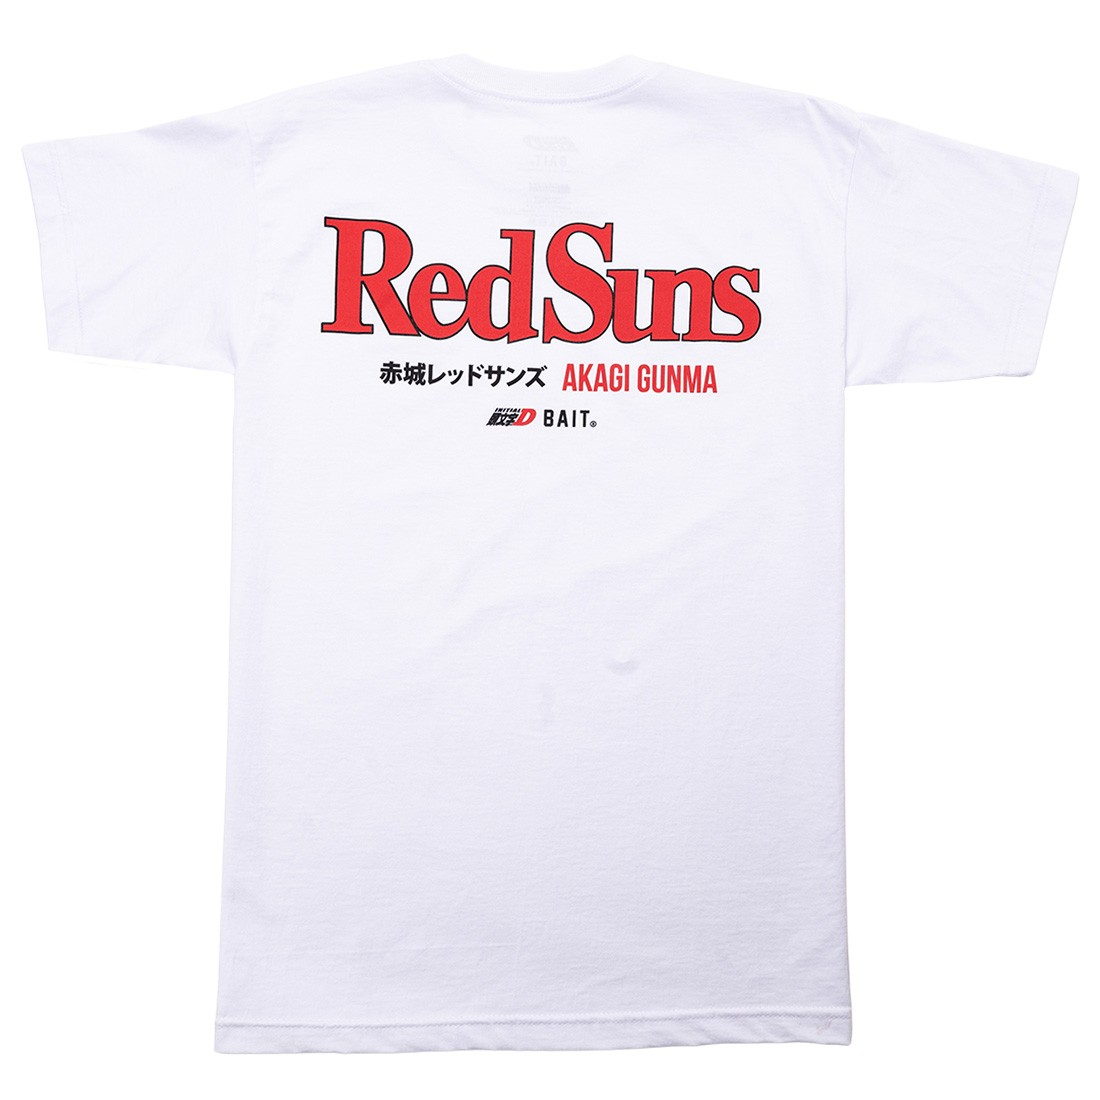 BAIT x Initial D Men Red Suns Tee (white)